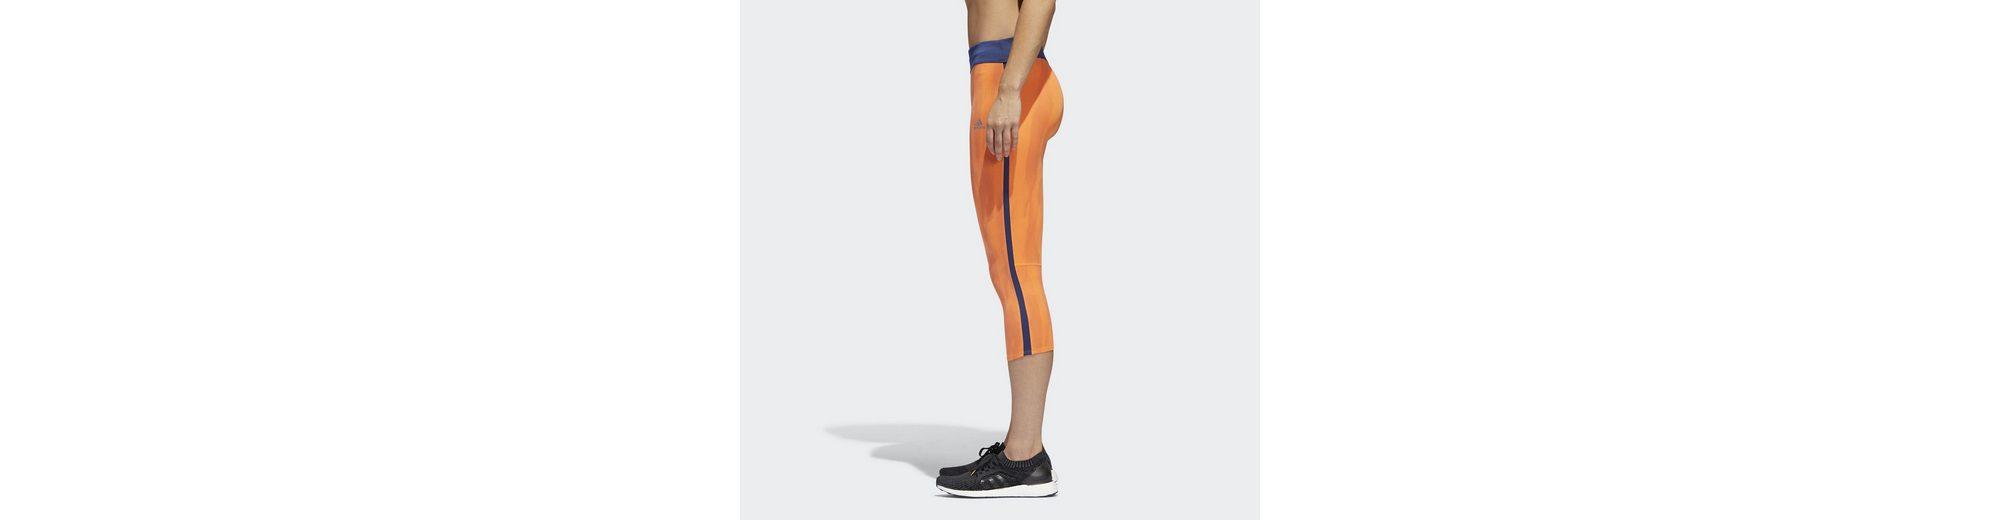 adidas Performance Leggings Response 3/4 100% Original Günstig Online q8H4LR4ae